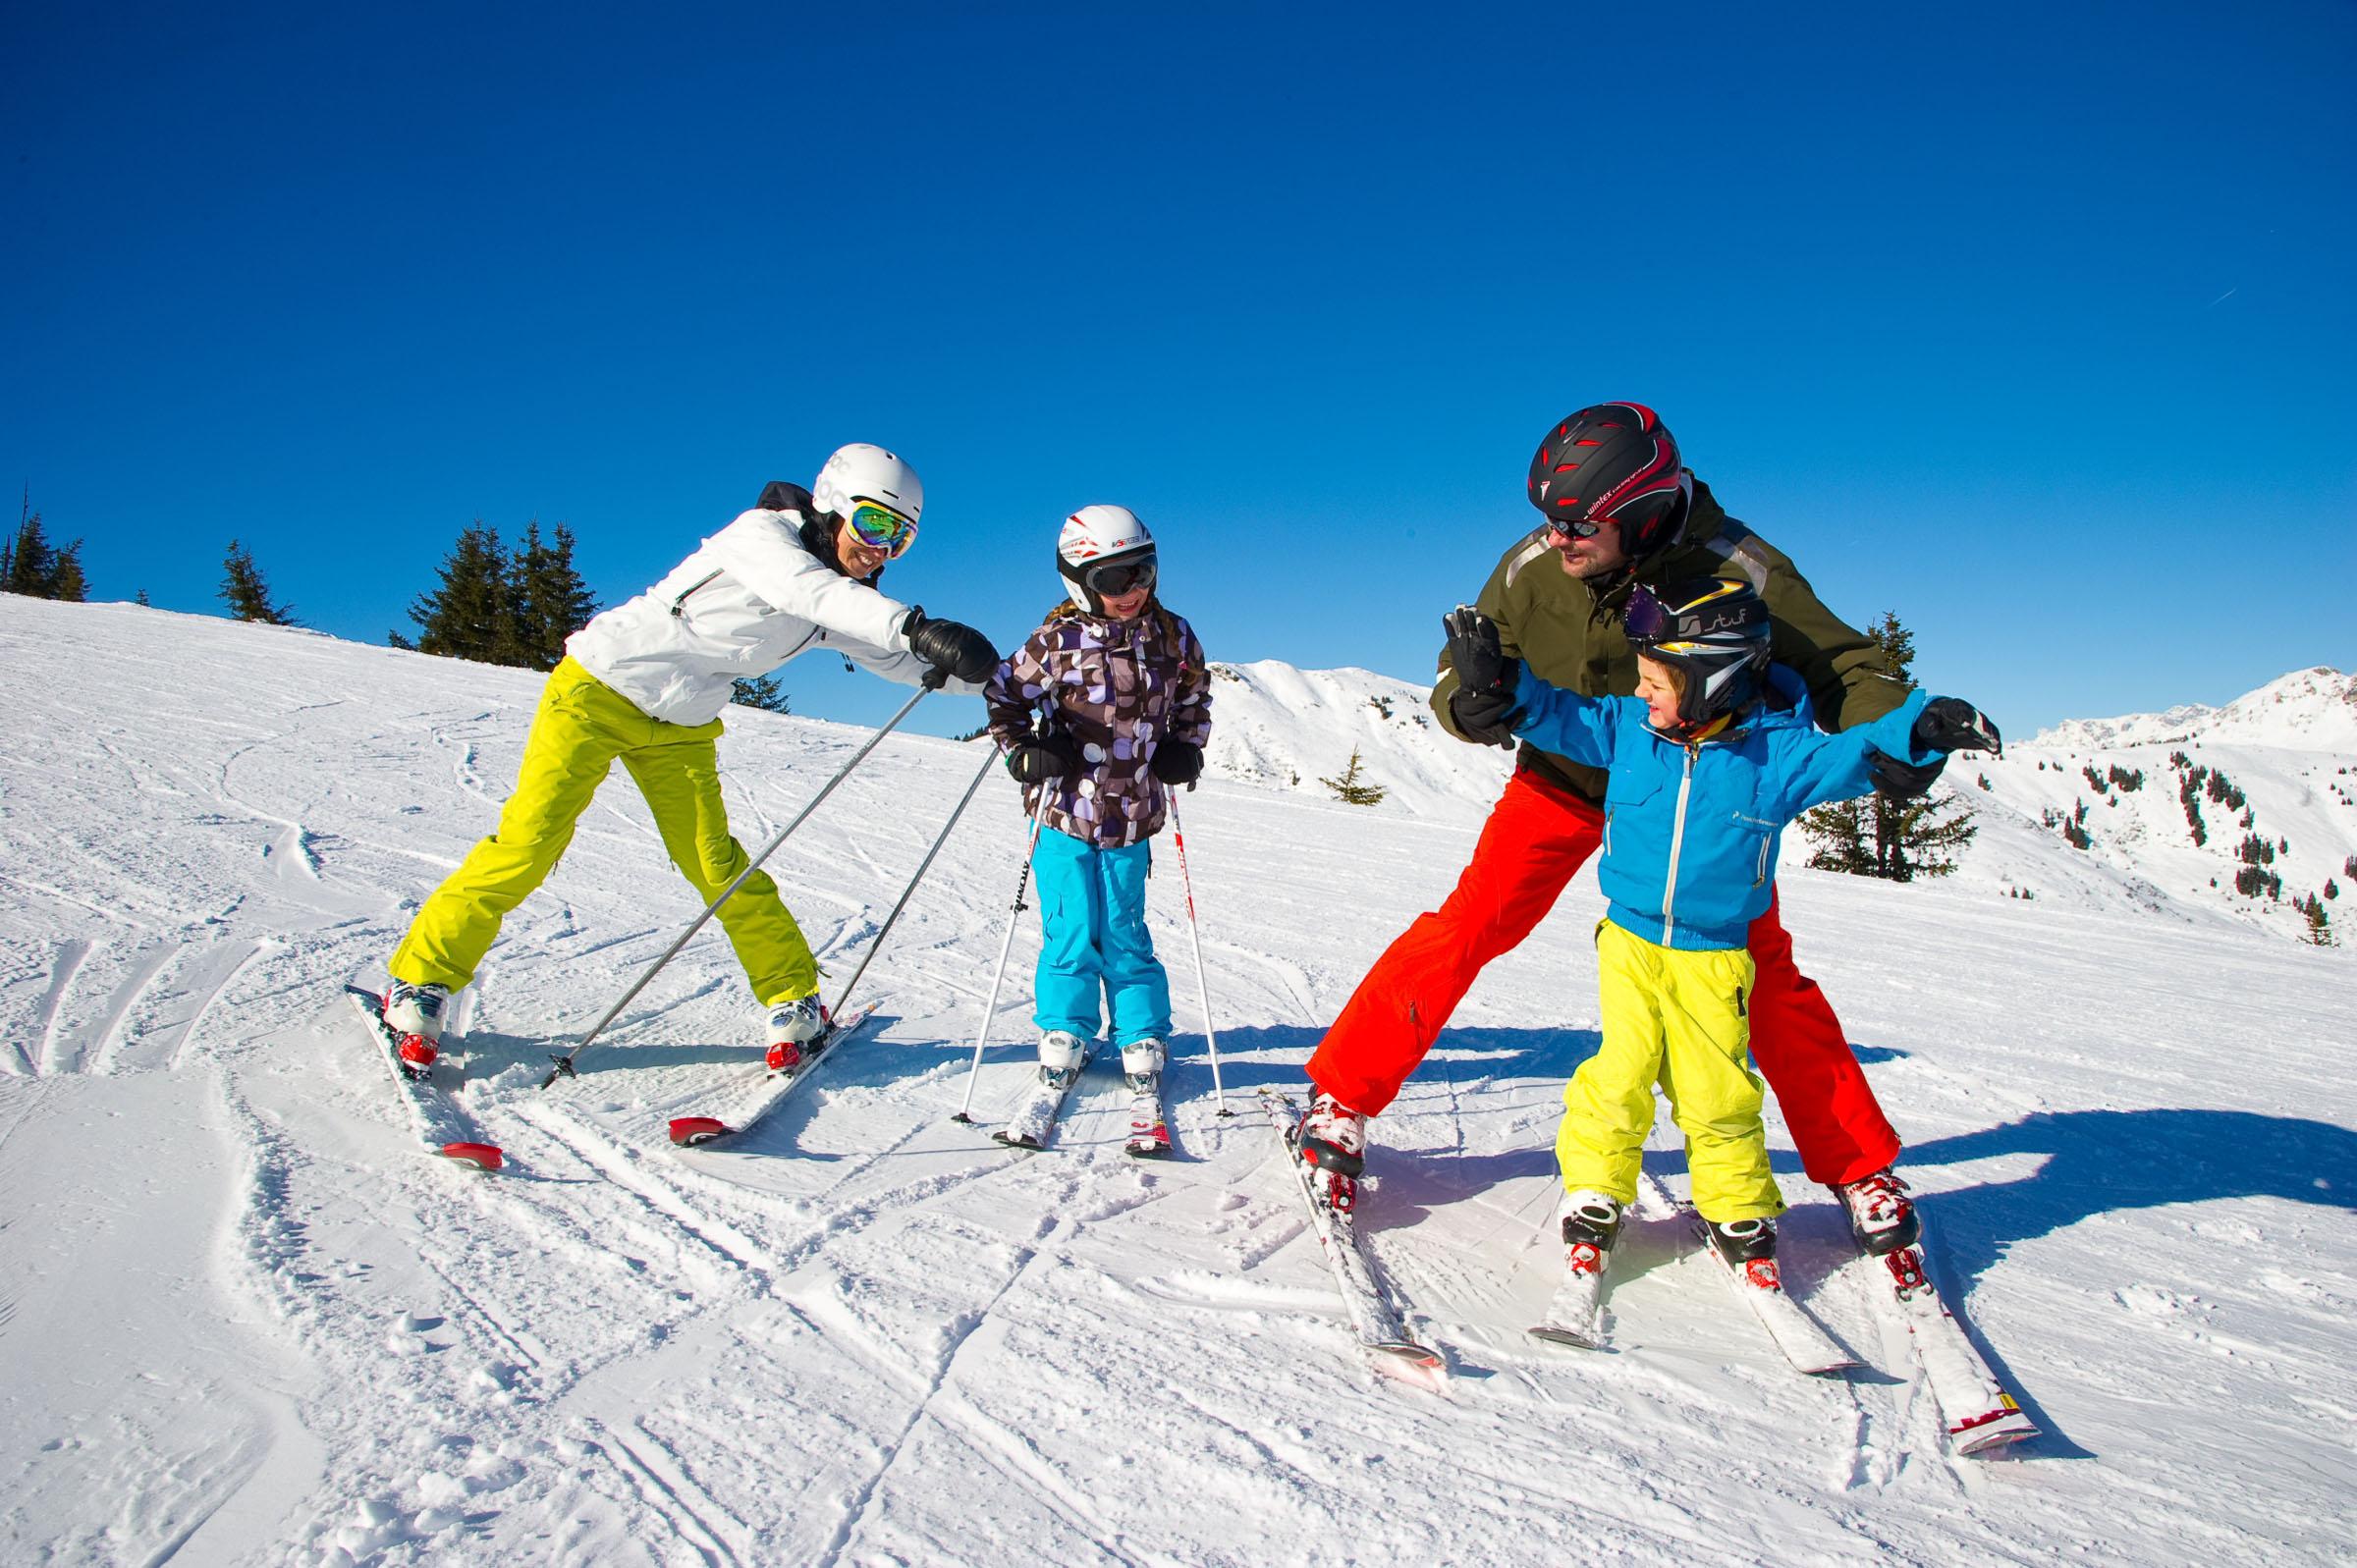 ferienhaus-grabenhaeusl-familien-skifahren-winter